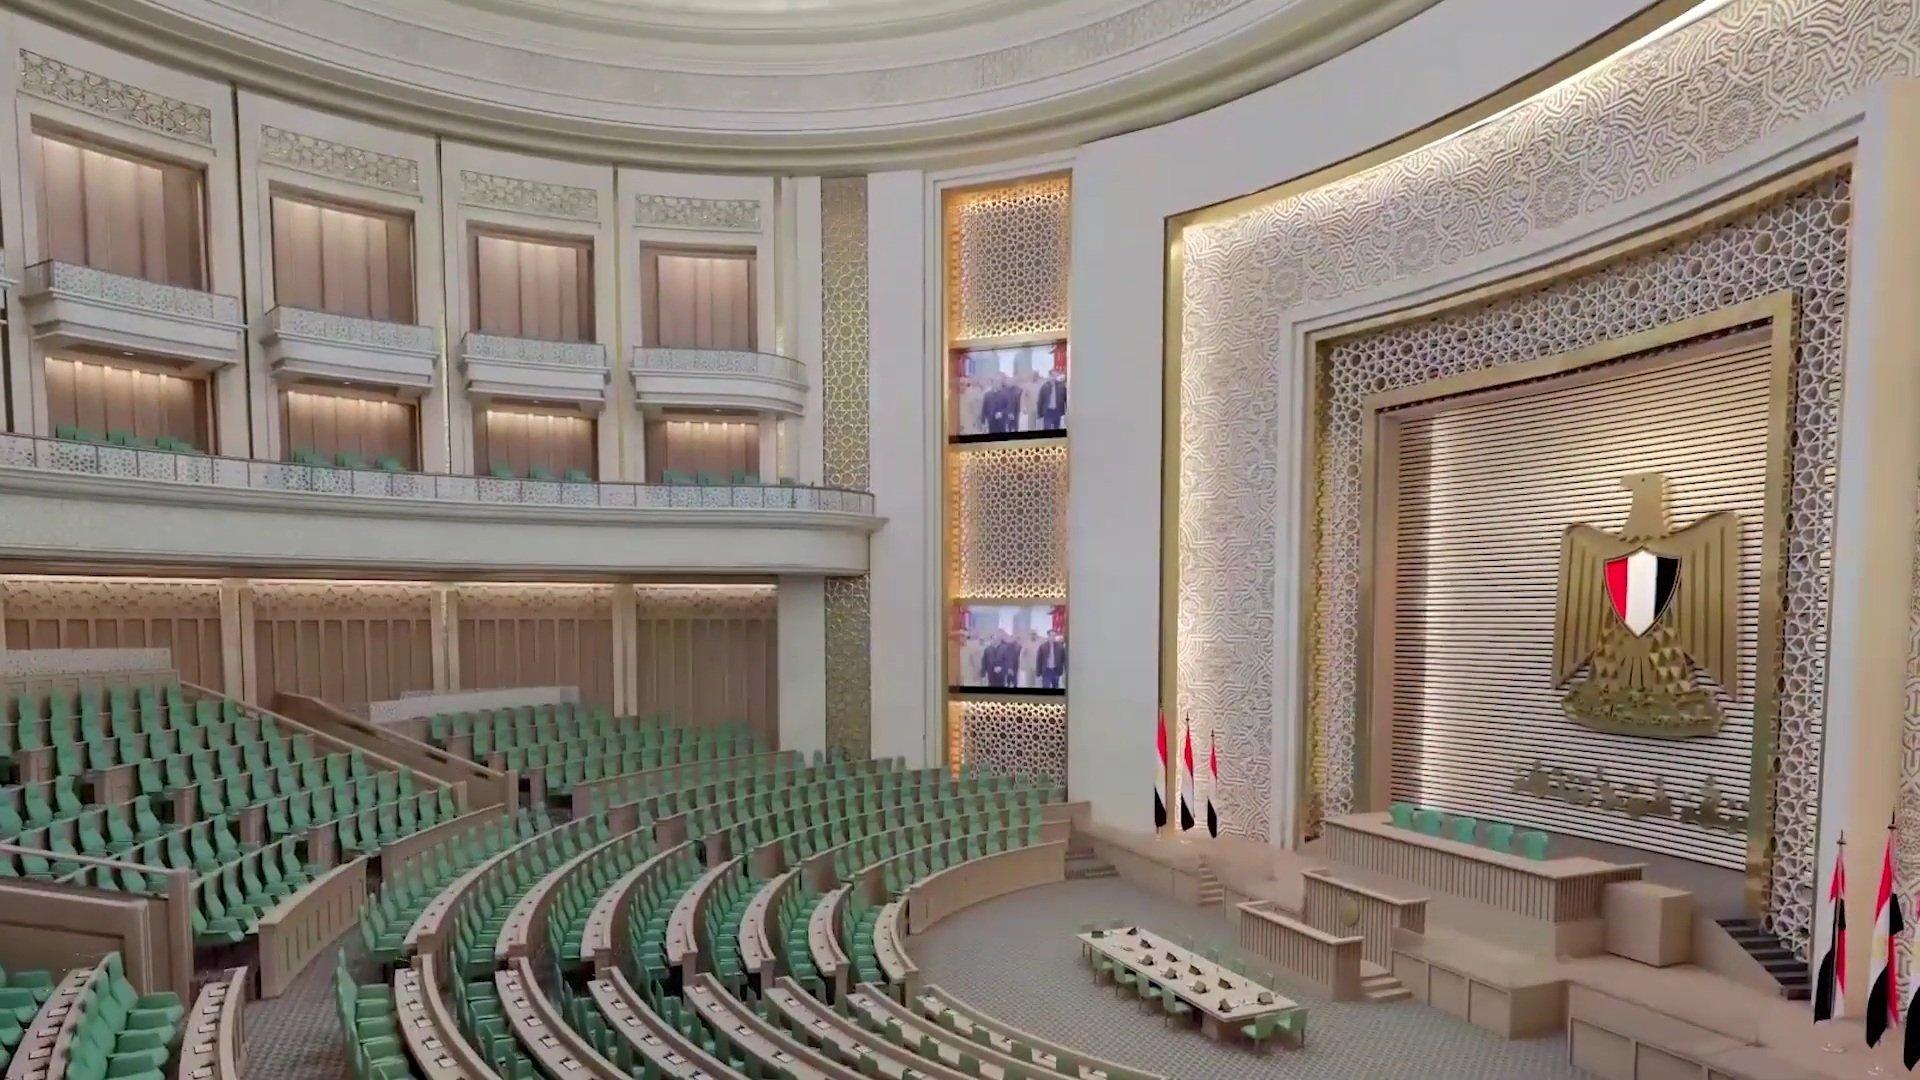 2021-08-29 Egypt Parliament New Administrative Capital 2021 Hall 03